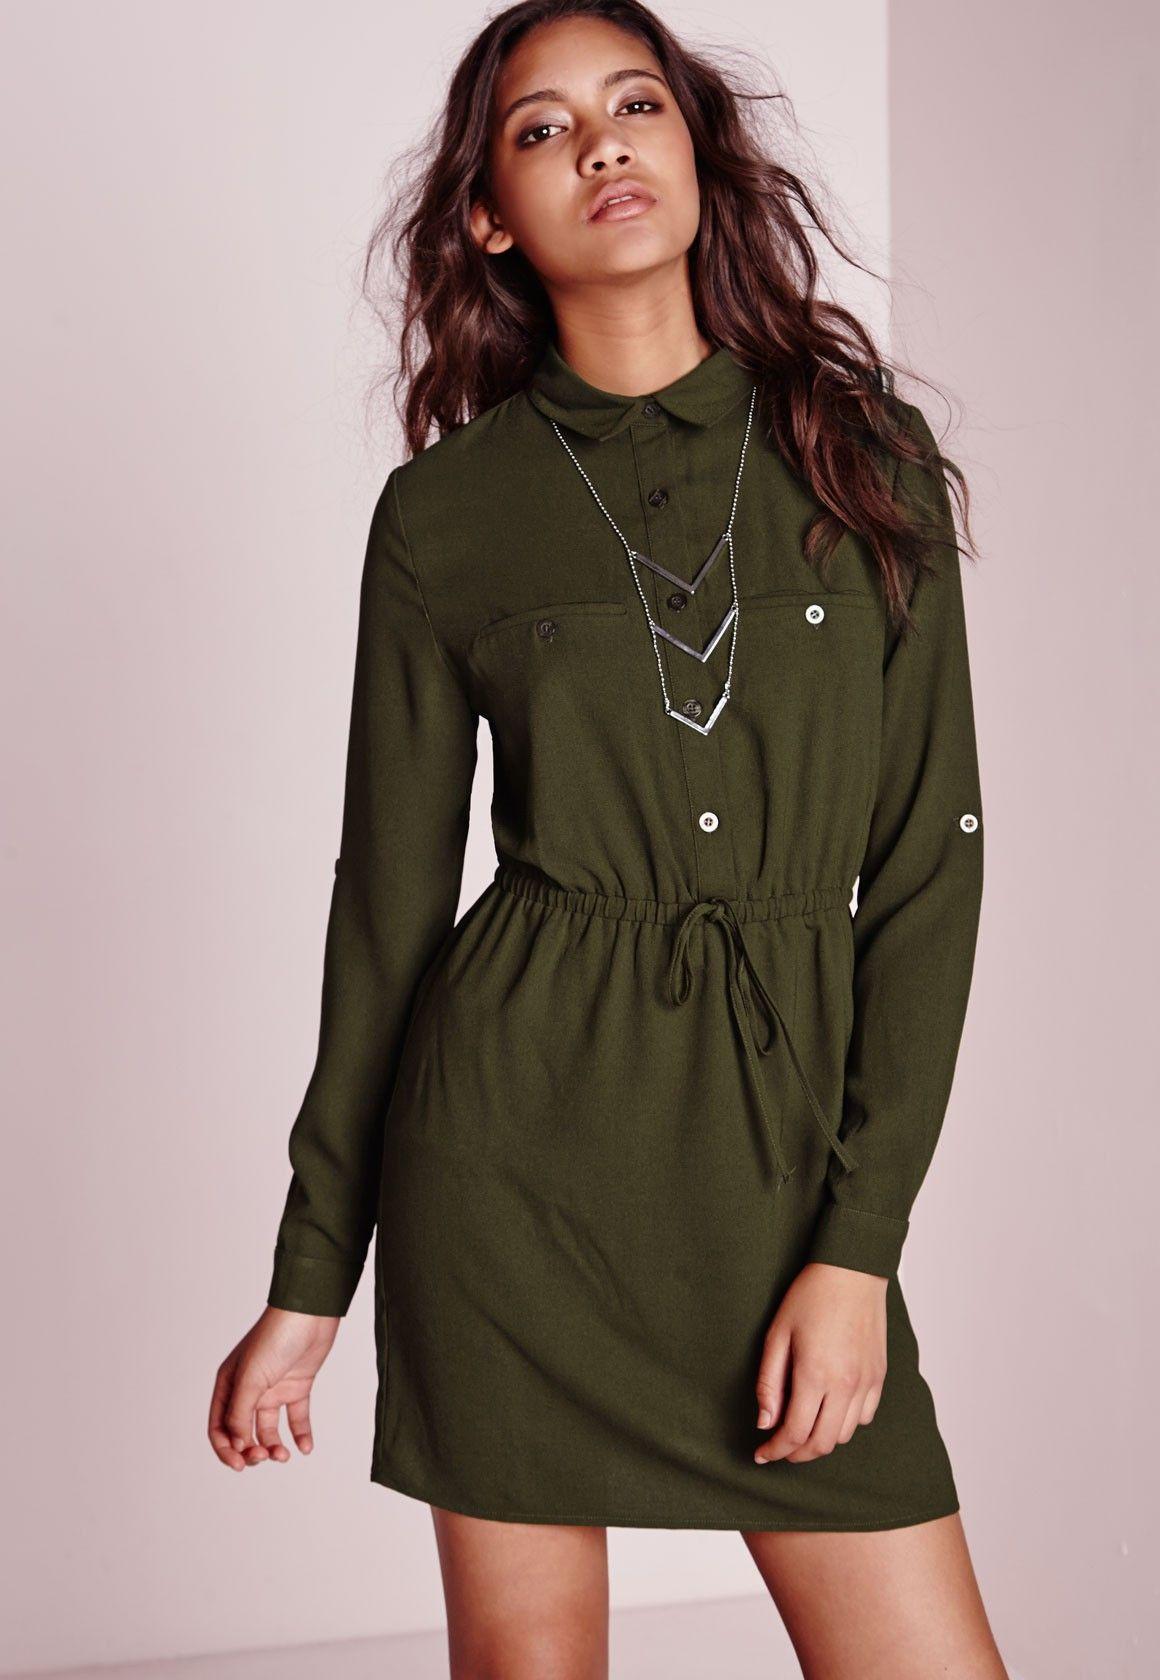 Missguided drawstring waist shirt dress khaki stylemilitary